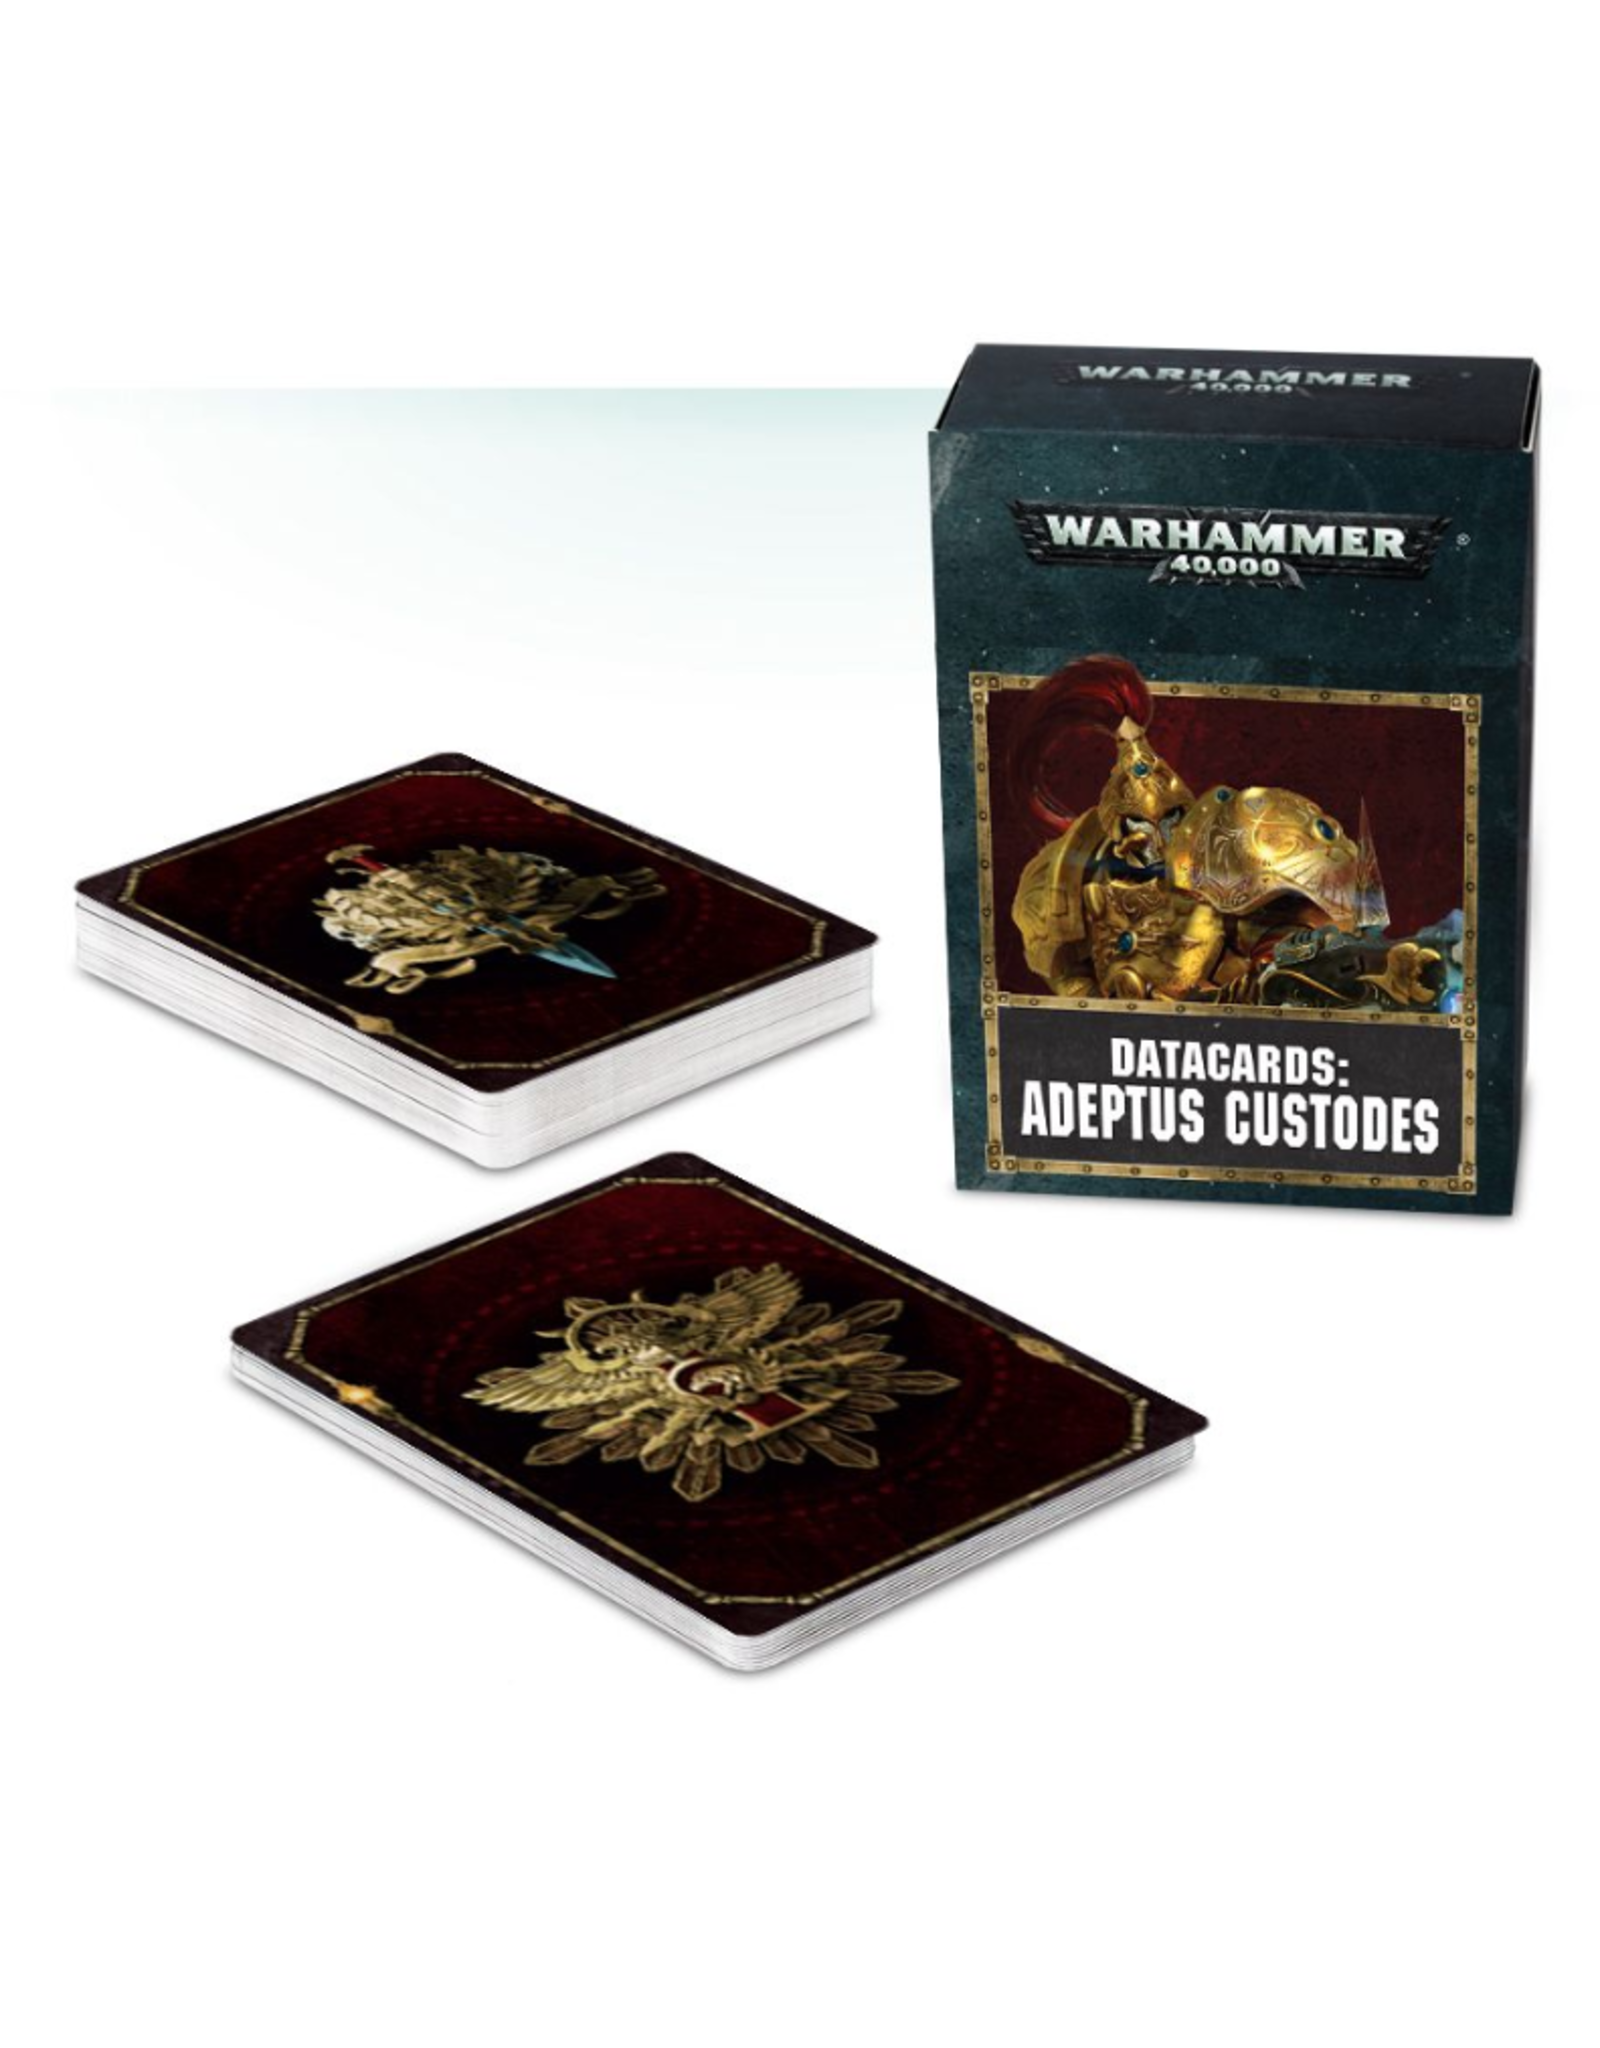 Warhammer 40K Datacards Adeptus Custodes